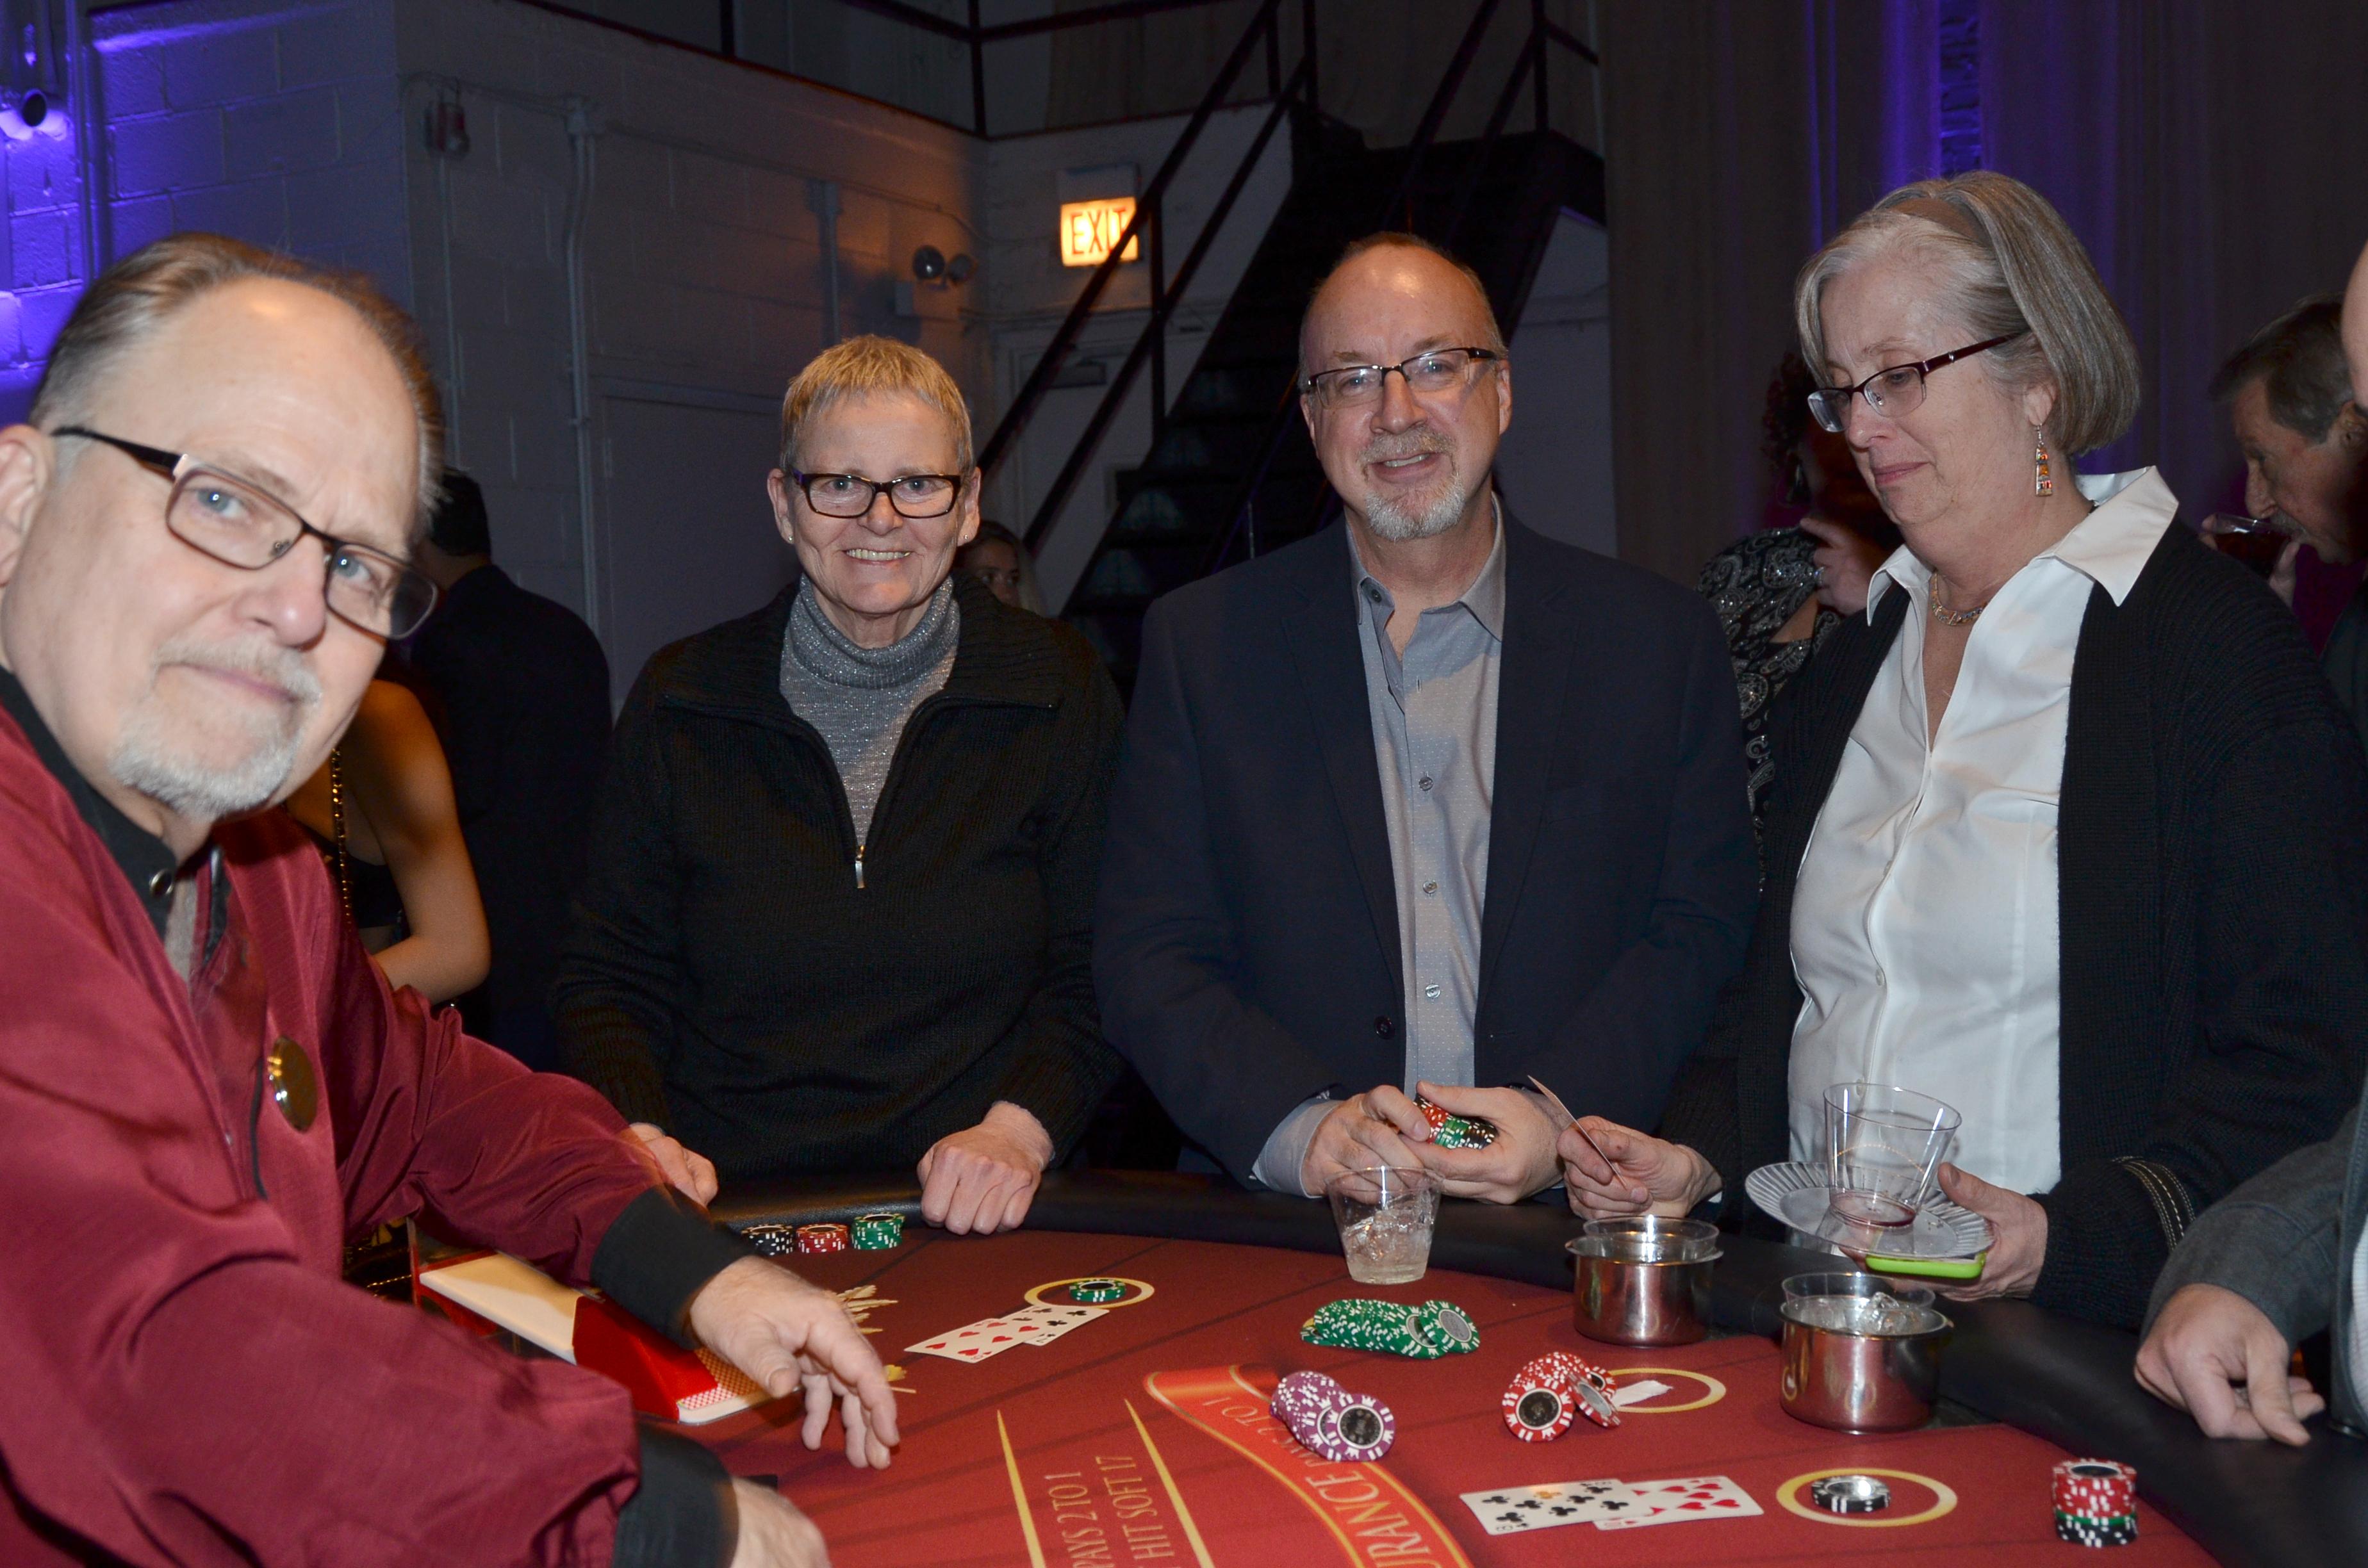 007-Jill-Burgn-Mike-Hobin-Nancy-Butzen-JPG.jpg